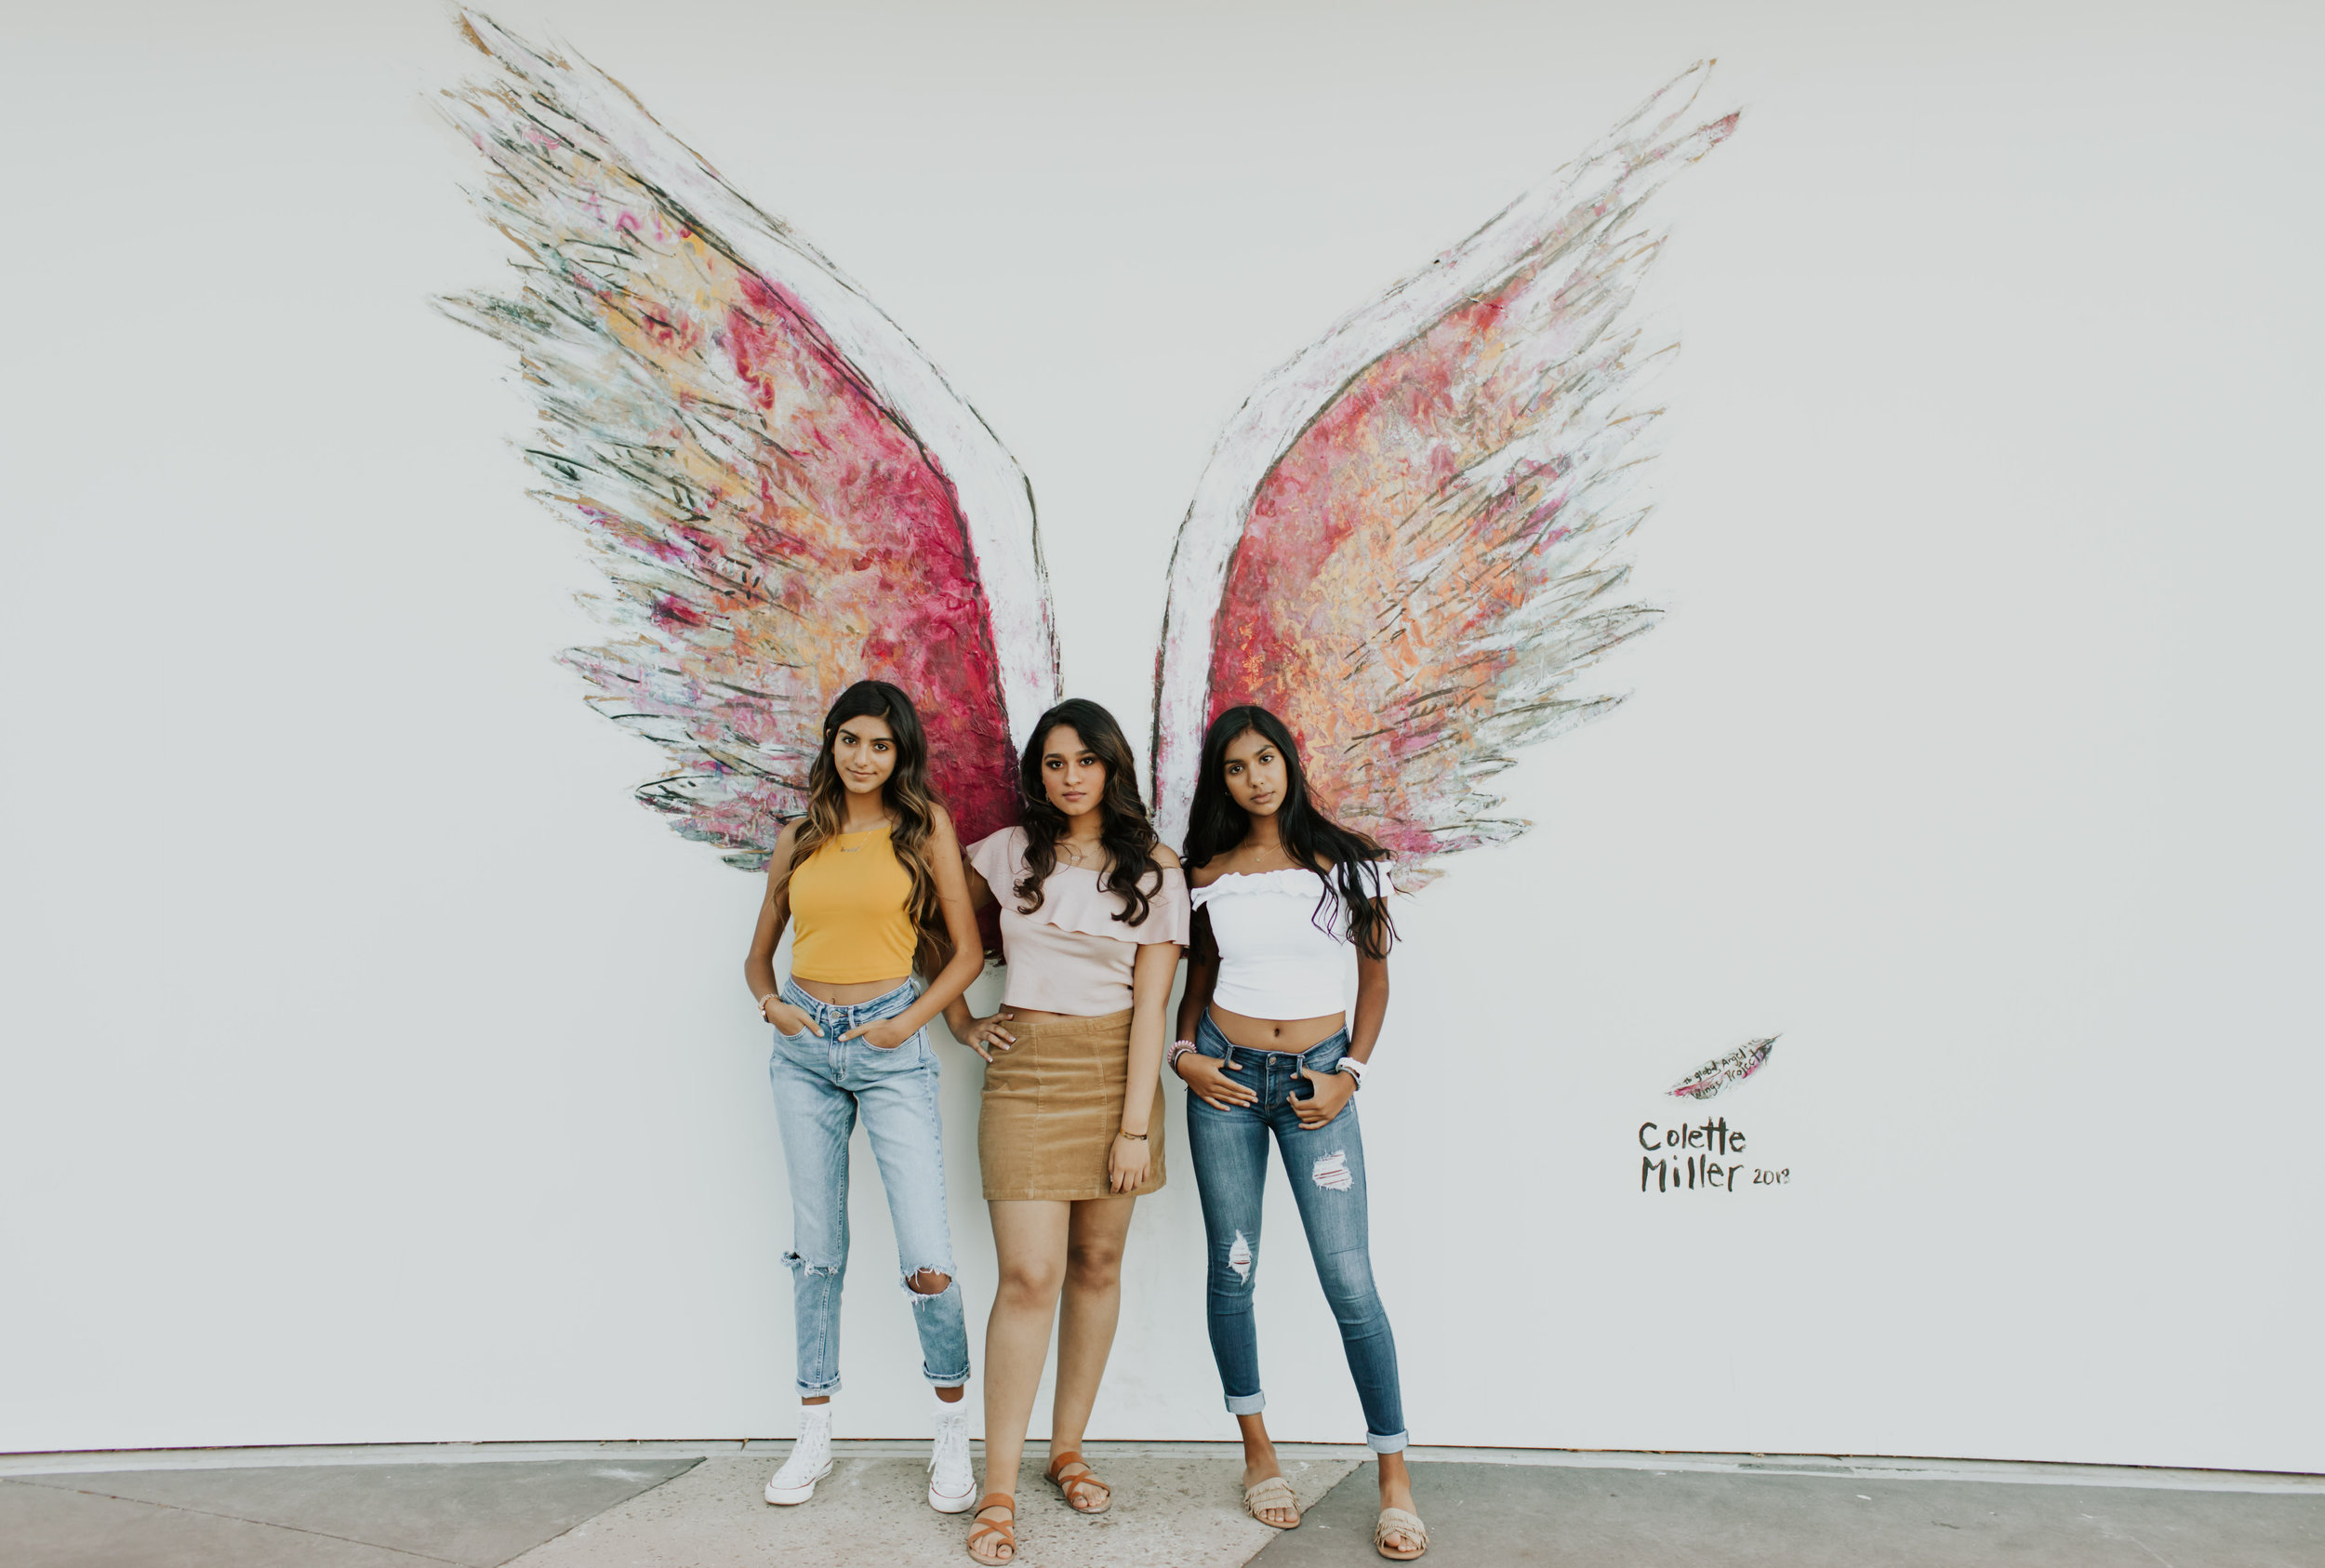 Alyssa | Raghu | Jacq and Jack | bonjour Nona | Lake Nona Social | Tavistock | The global angel wings project | Colette Miller | Vanessa Boy (93 of 57).jpg